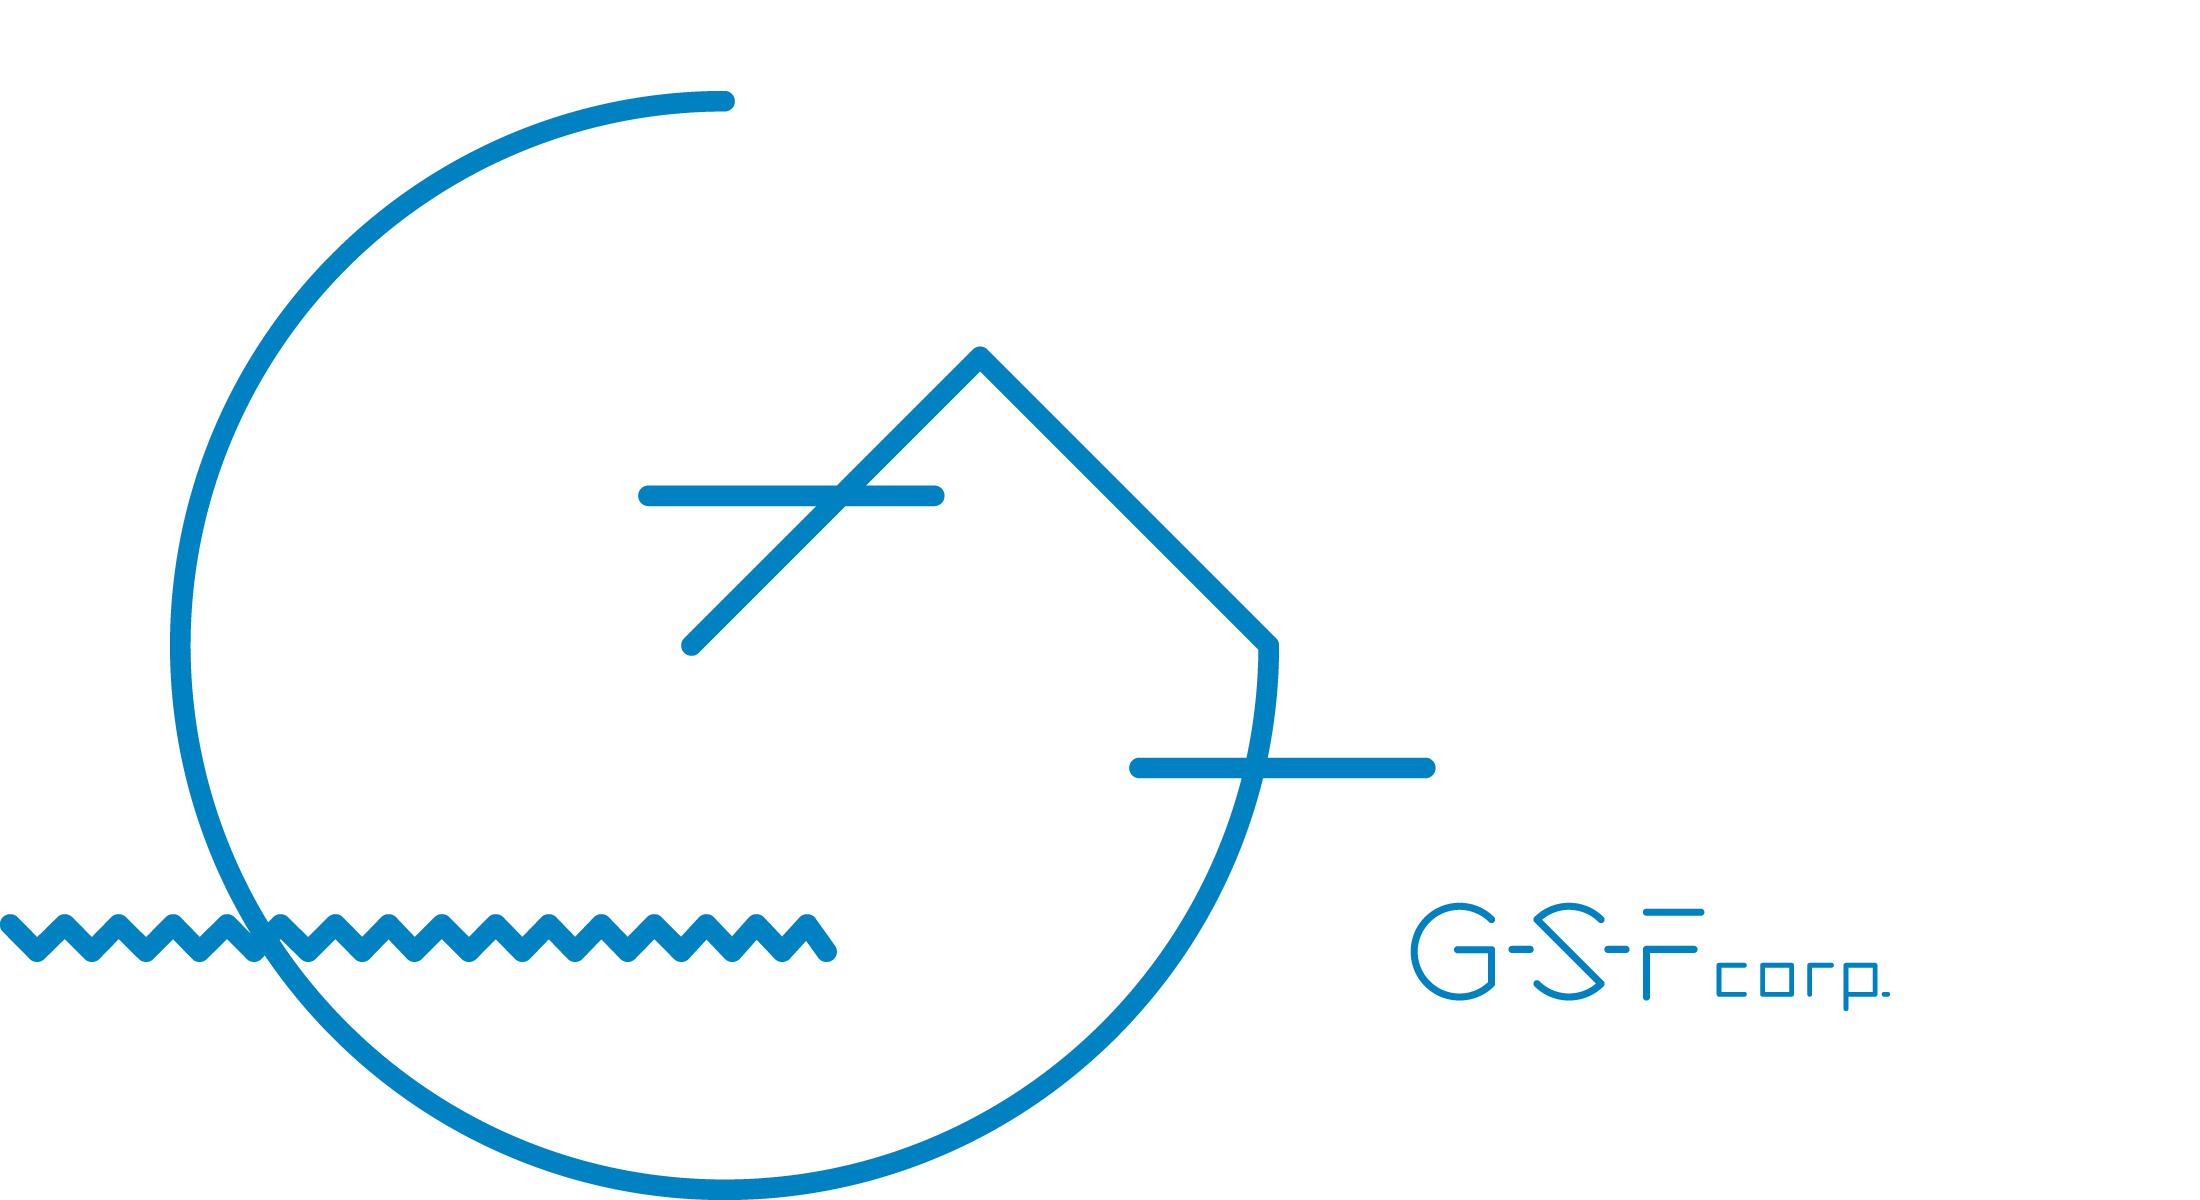 株式会社 G-S-F